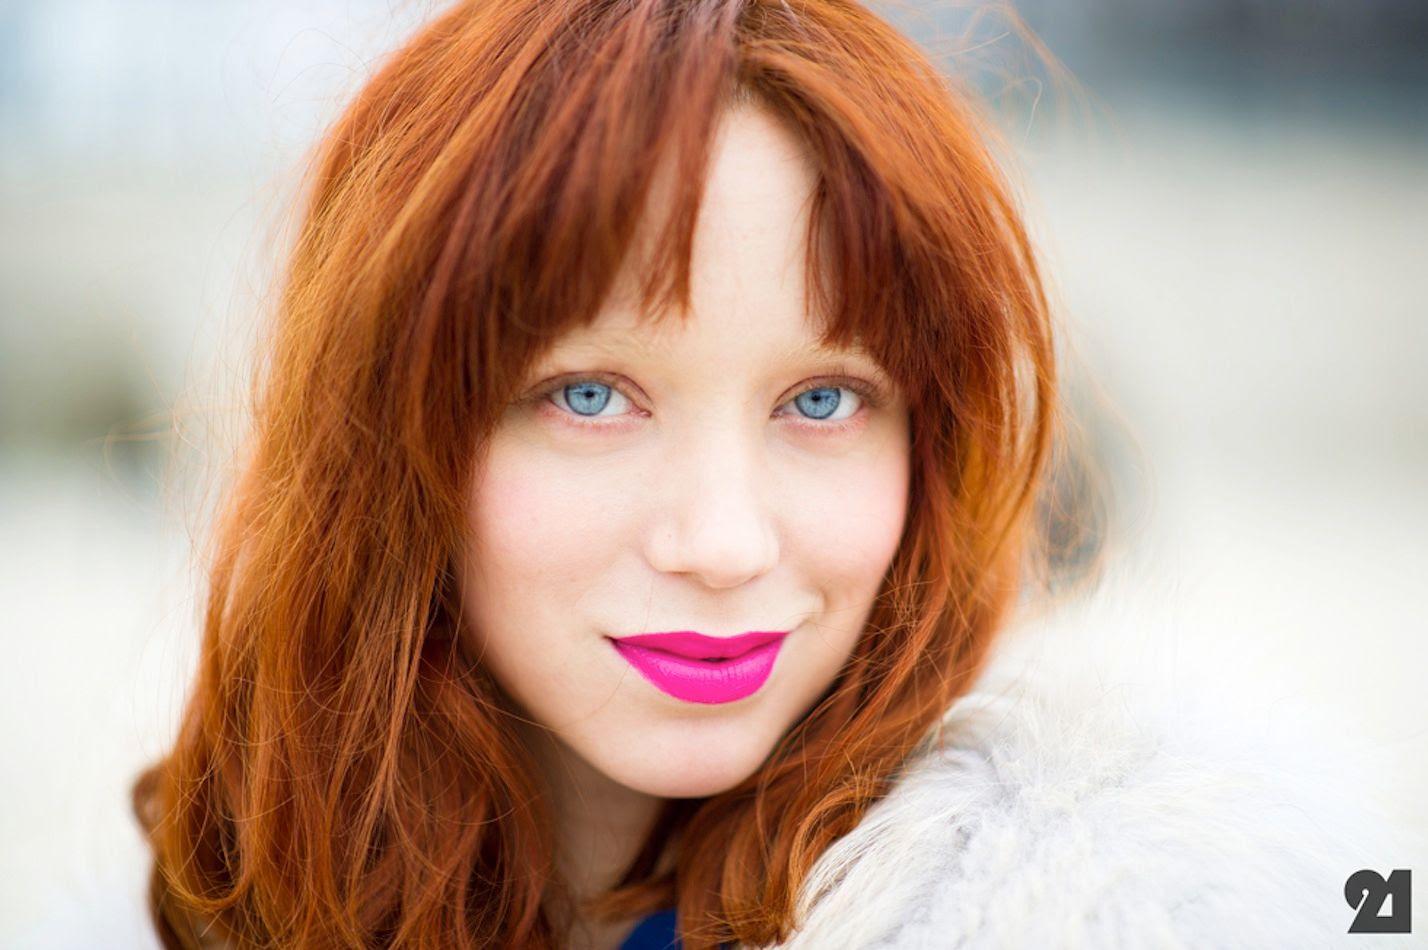 9 Inspiring Redheads Red Hair Inspiration Bangs Hot Pink Lipstick Judith Bedard Model Street Style Via Adam Katz Sinding Le 21eme photo 9-Inspiring-Redheads-Red-Hair-Inspiration-Bangs-Hot-Pink-Lipstick-Judith-Bedard-Model-Street-Style-Via-Adam-Katz-Sinding-Le-21eme.jpg